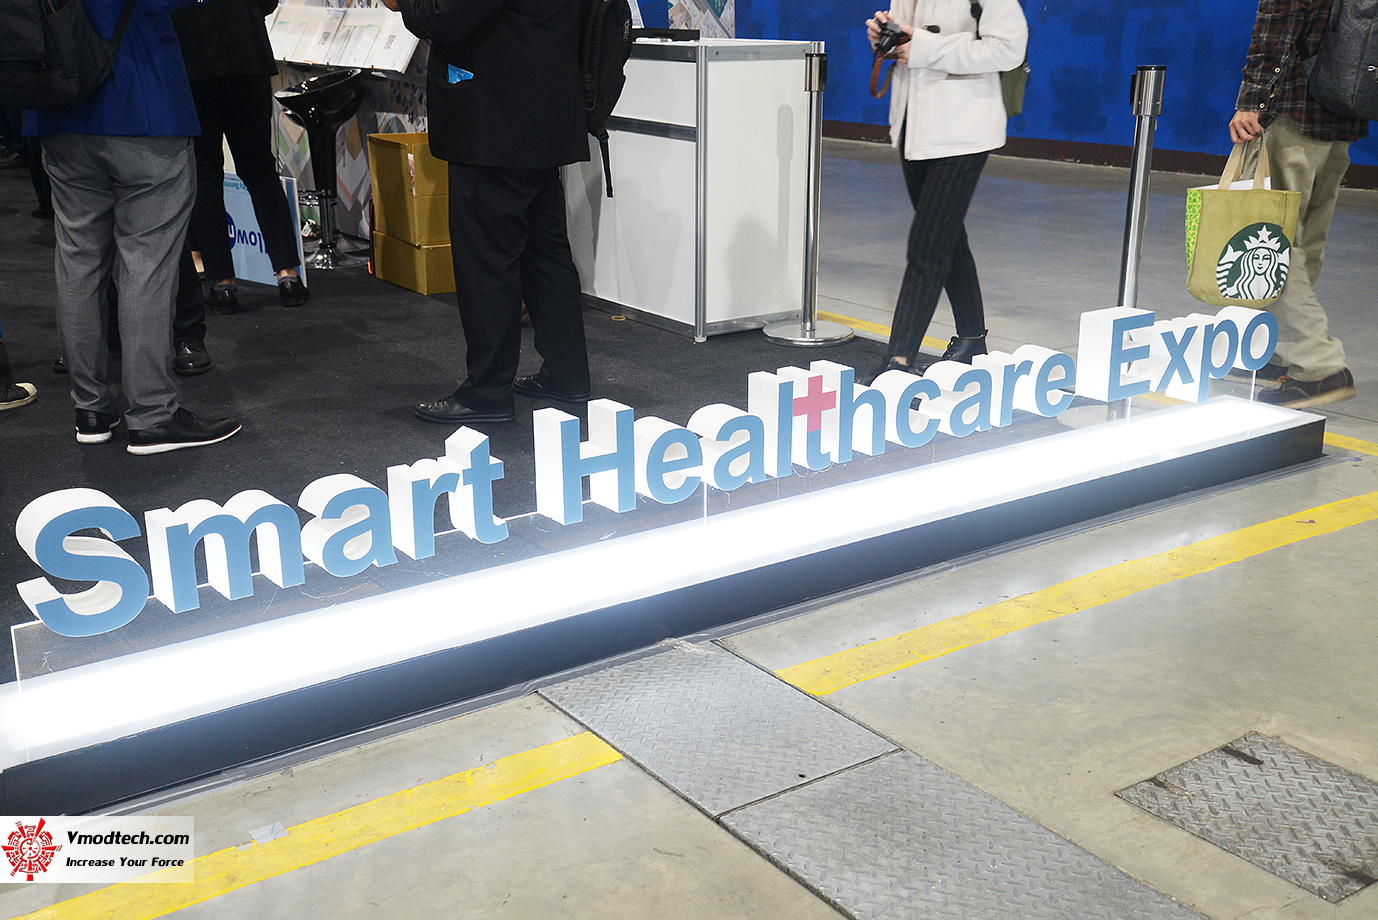 dsc 9121 เยี่ยมชมบูธ Smart Healthcare Expo กับเทคโนโลยีระบบการแพทย์และการดูแลสุขภาพอัจฉริยะในงาน 2019 SMART CITY SUMMIT & EXPO ณ กรุงไทเป ประเทศไต้หวัน